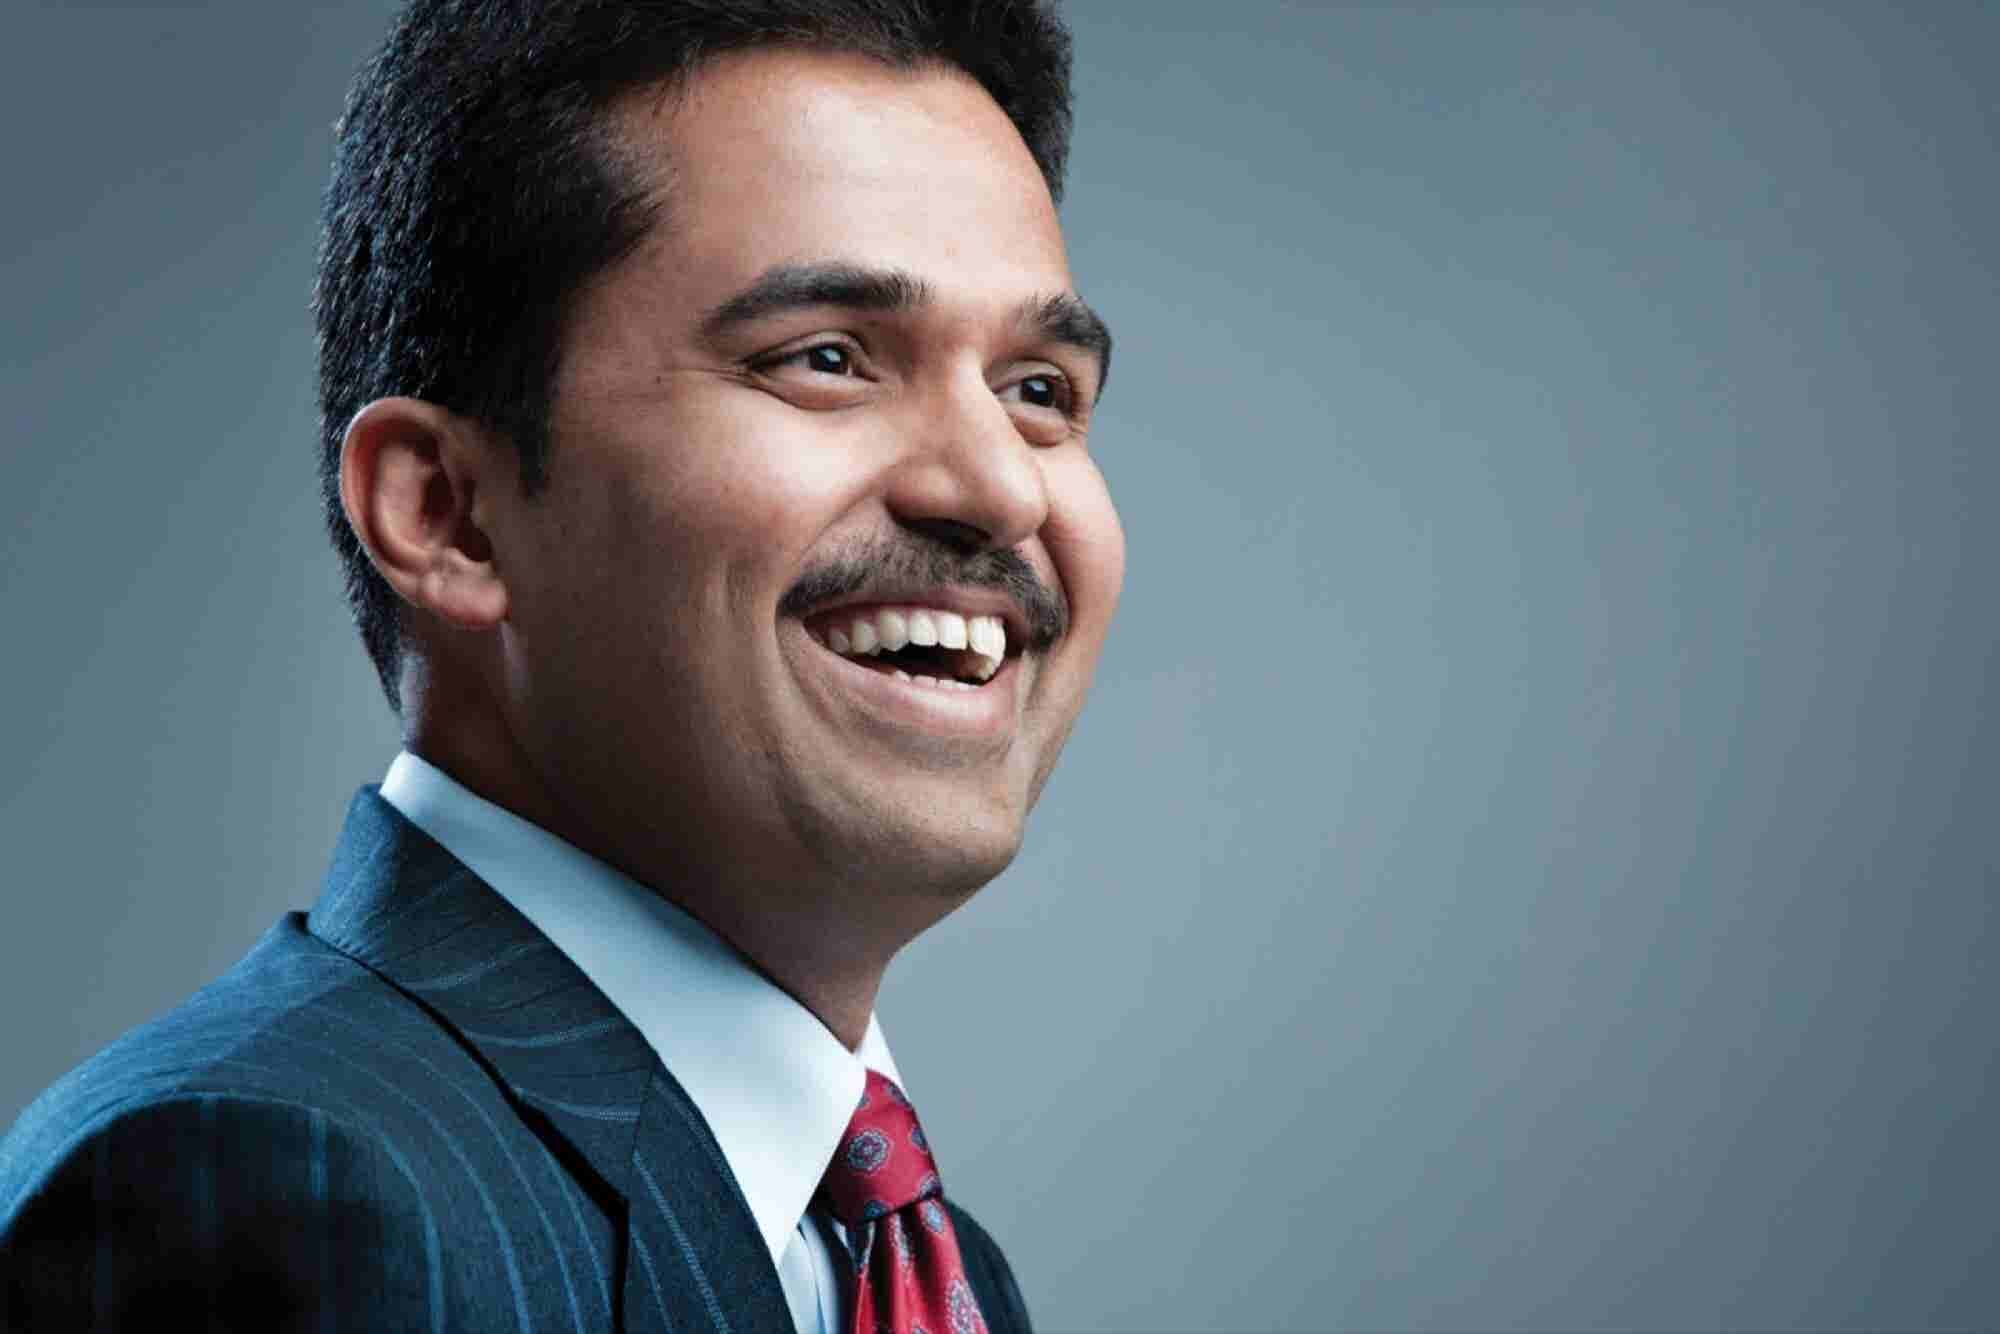 Empowering Excellence: Dr. Shamsheer Vayalil Parambath